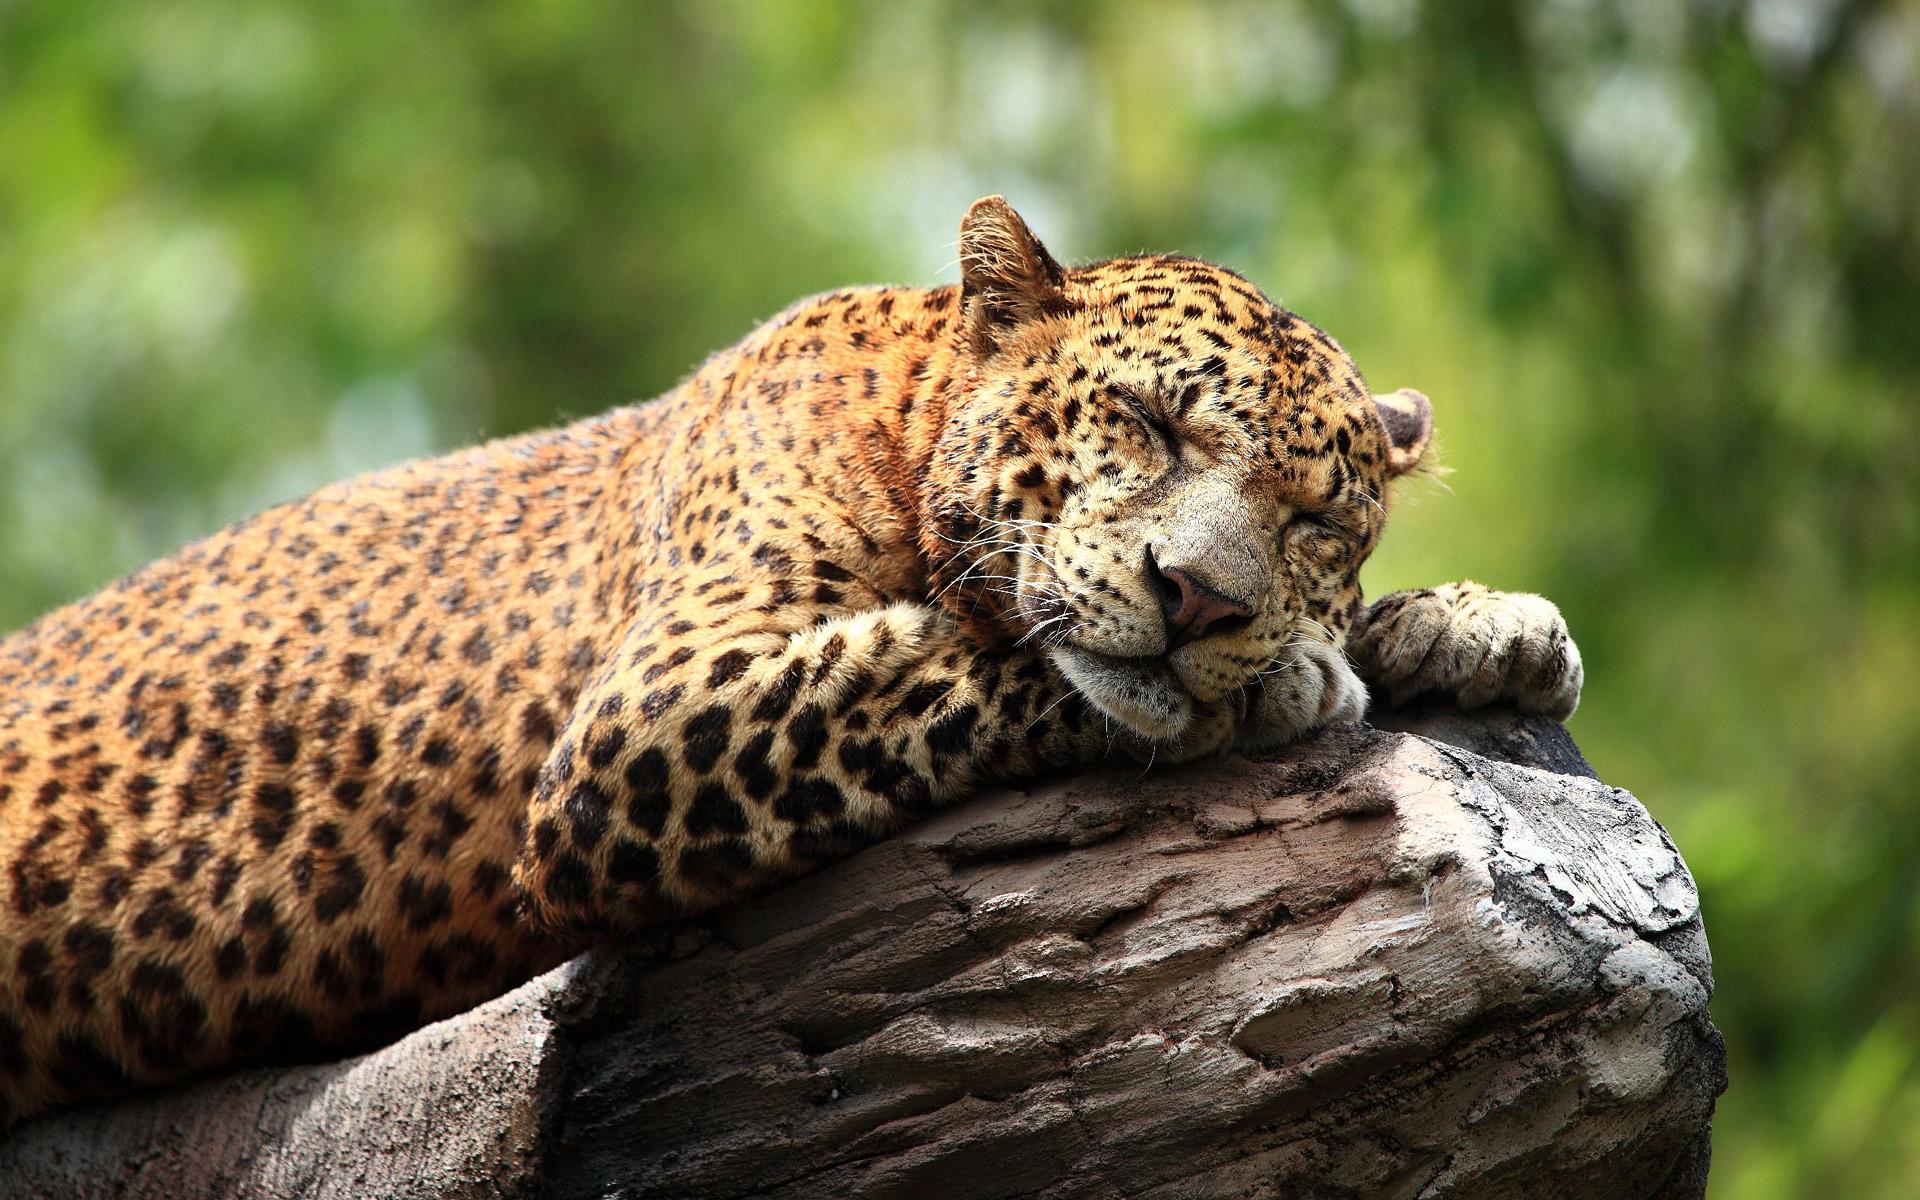 Cute Wallpapers Screensavers Sleeping Leopard Hd Desktop Wallpapers 4k Hd